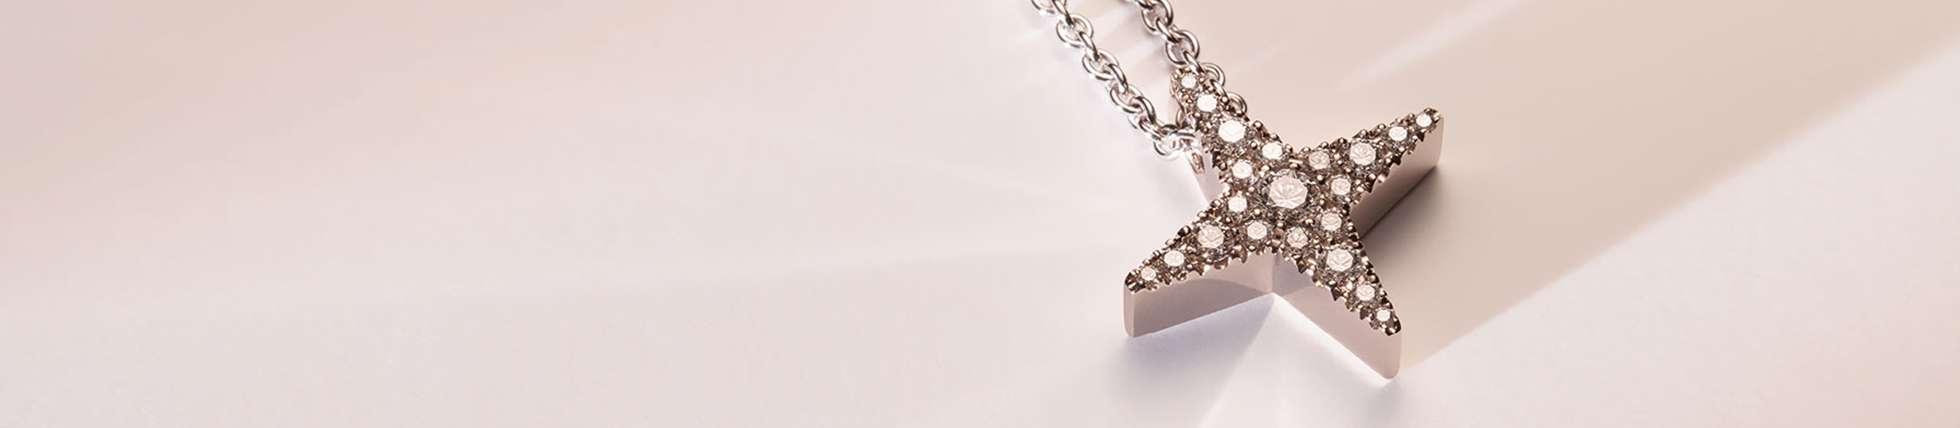 Diamant-Schmuck